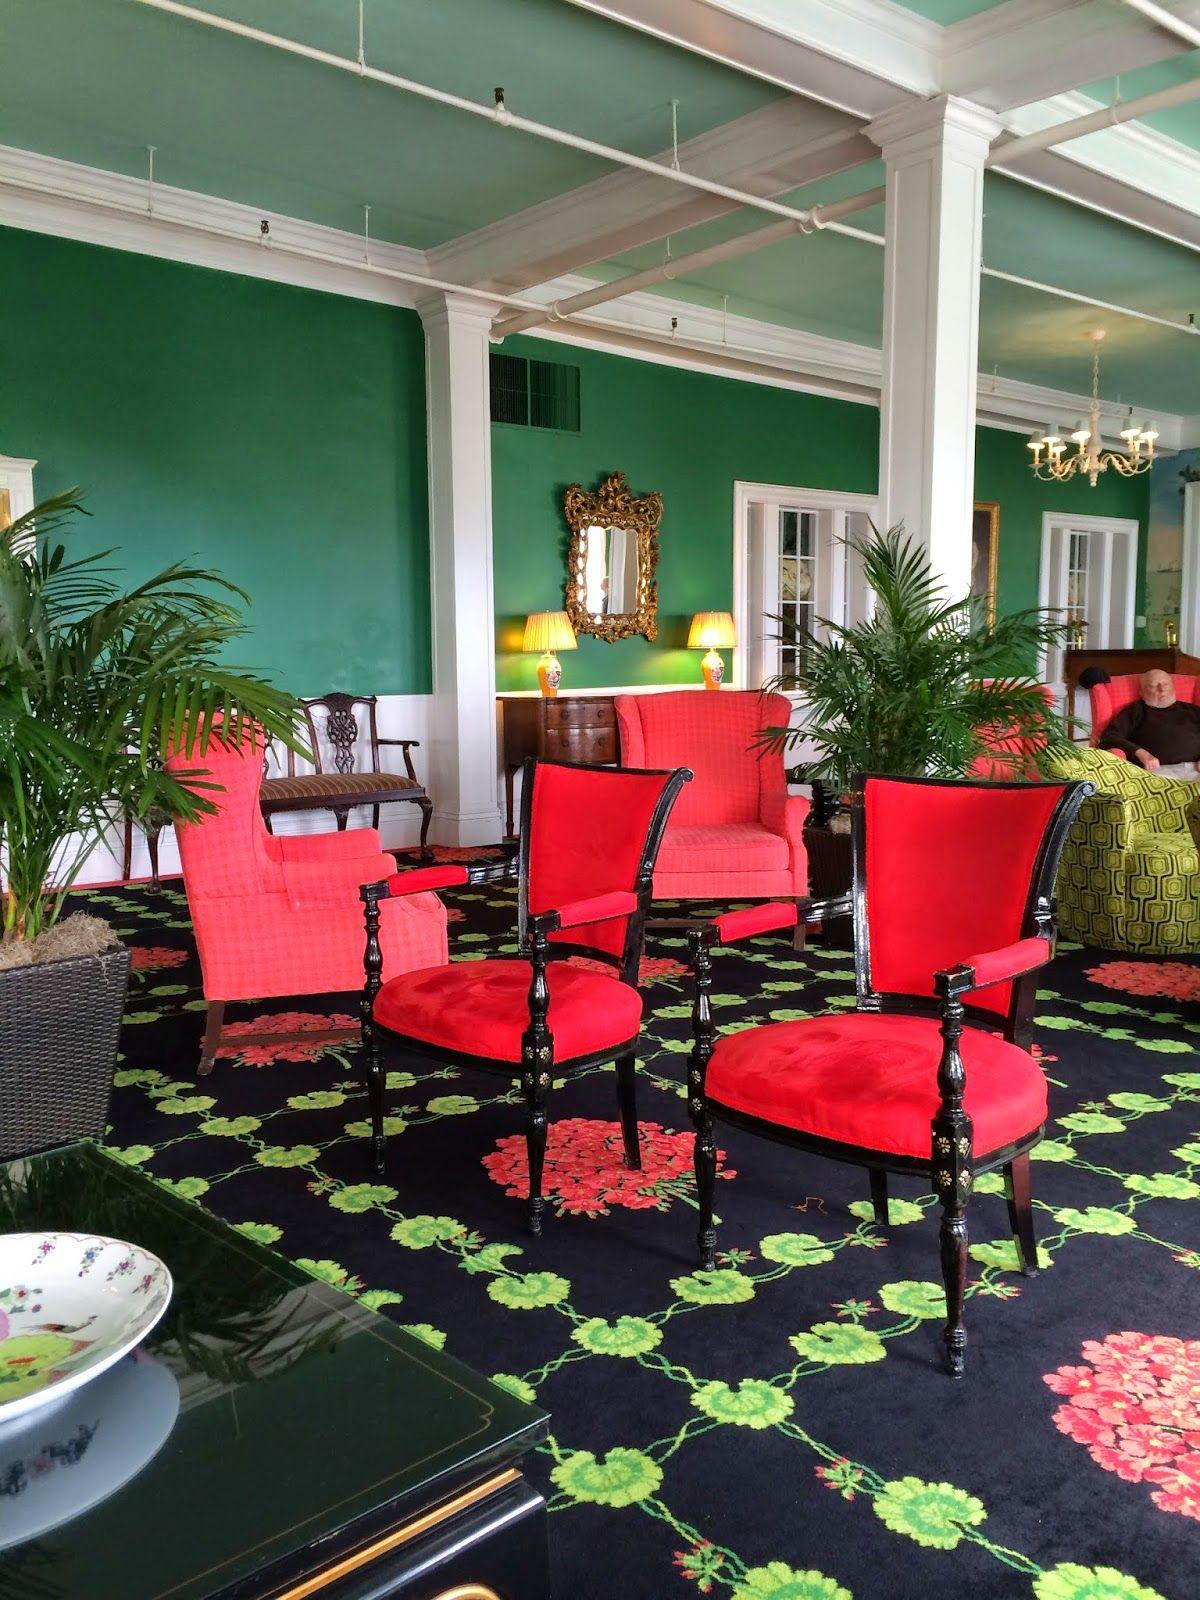 Christa Pirl Furniture Interiors At The Grand Grand Hotel Mackinac Island Interior Design Student Hotels Design